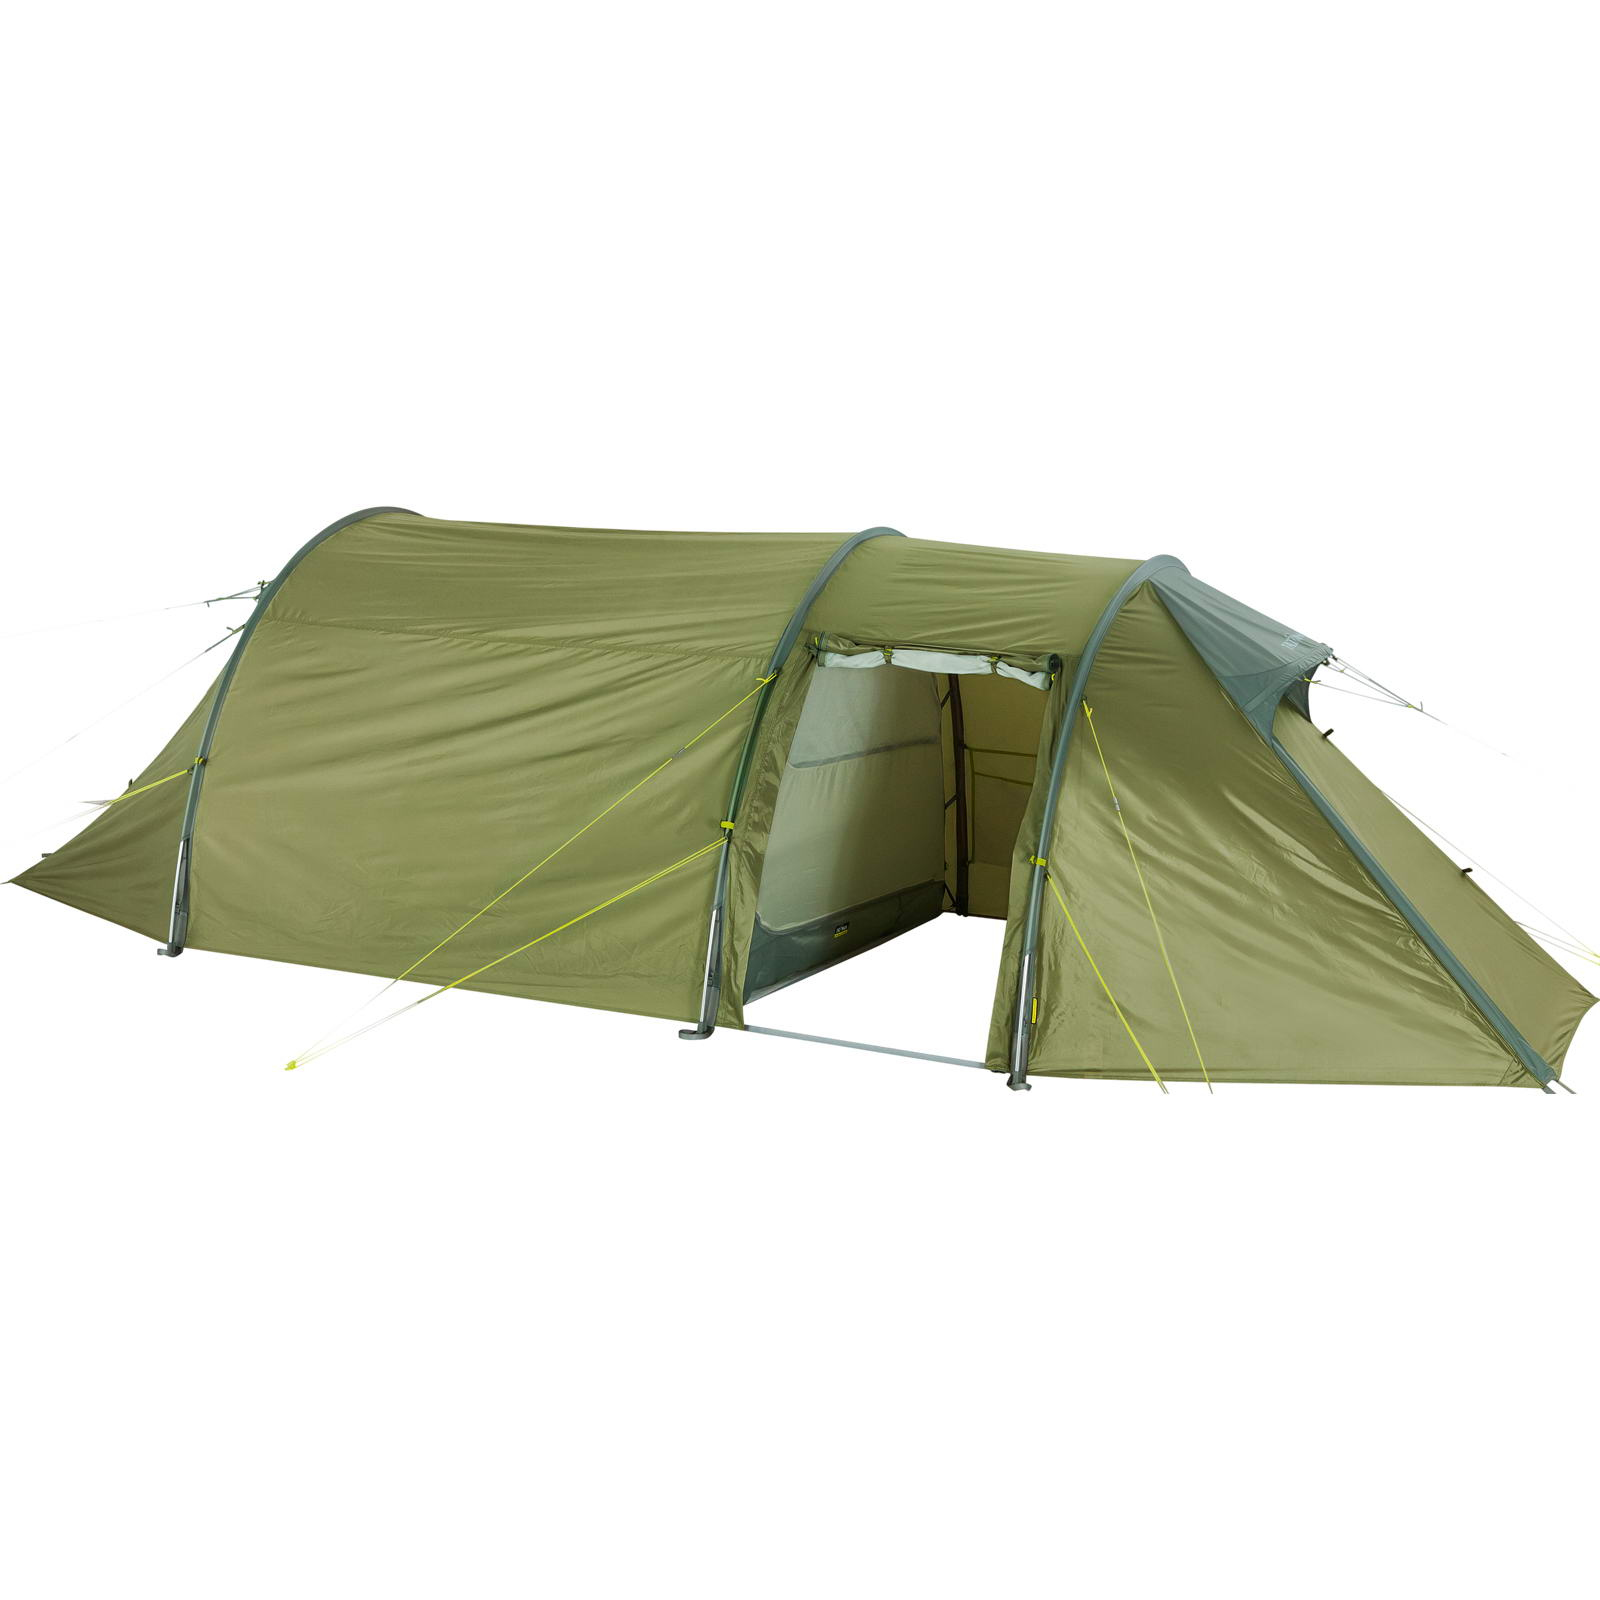 b0d323a9652ea 3-Personen Zelte günstig kaufen im outdoortrends Shop